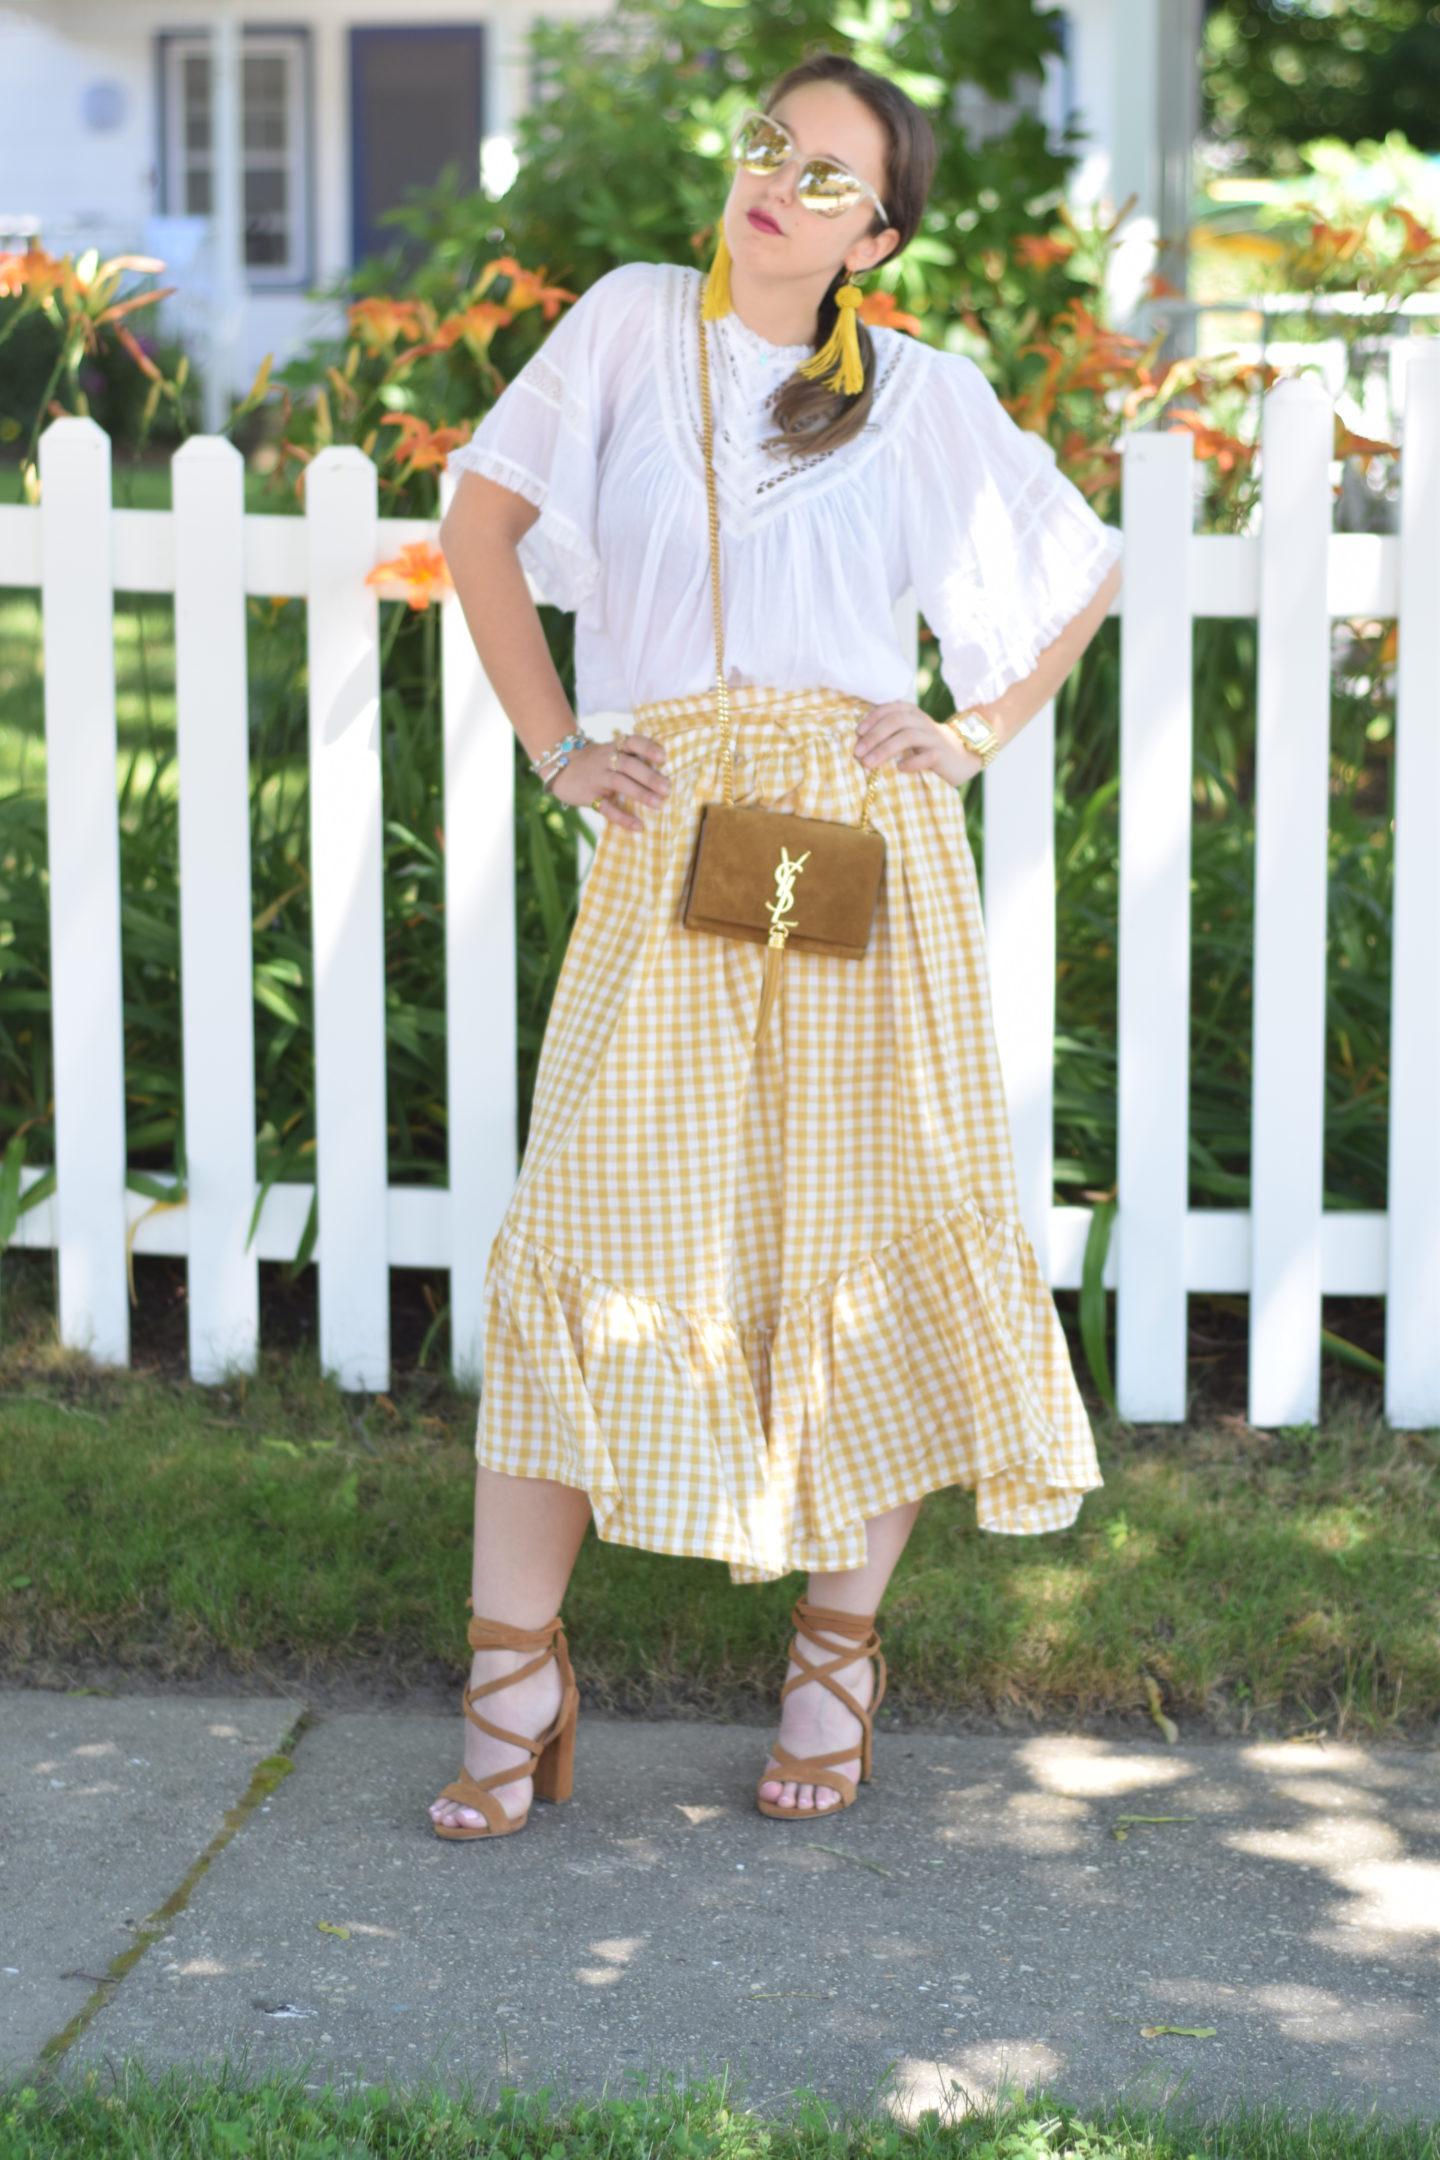 style-new york-blogger-street style